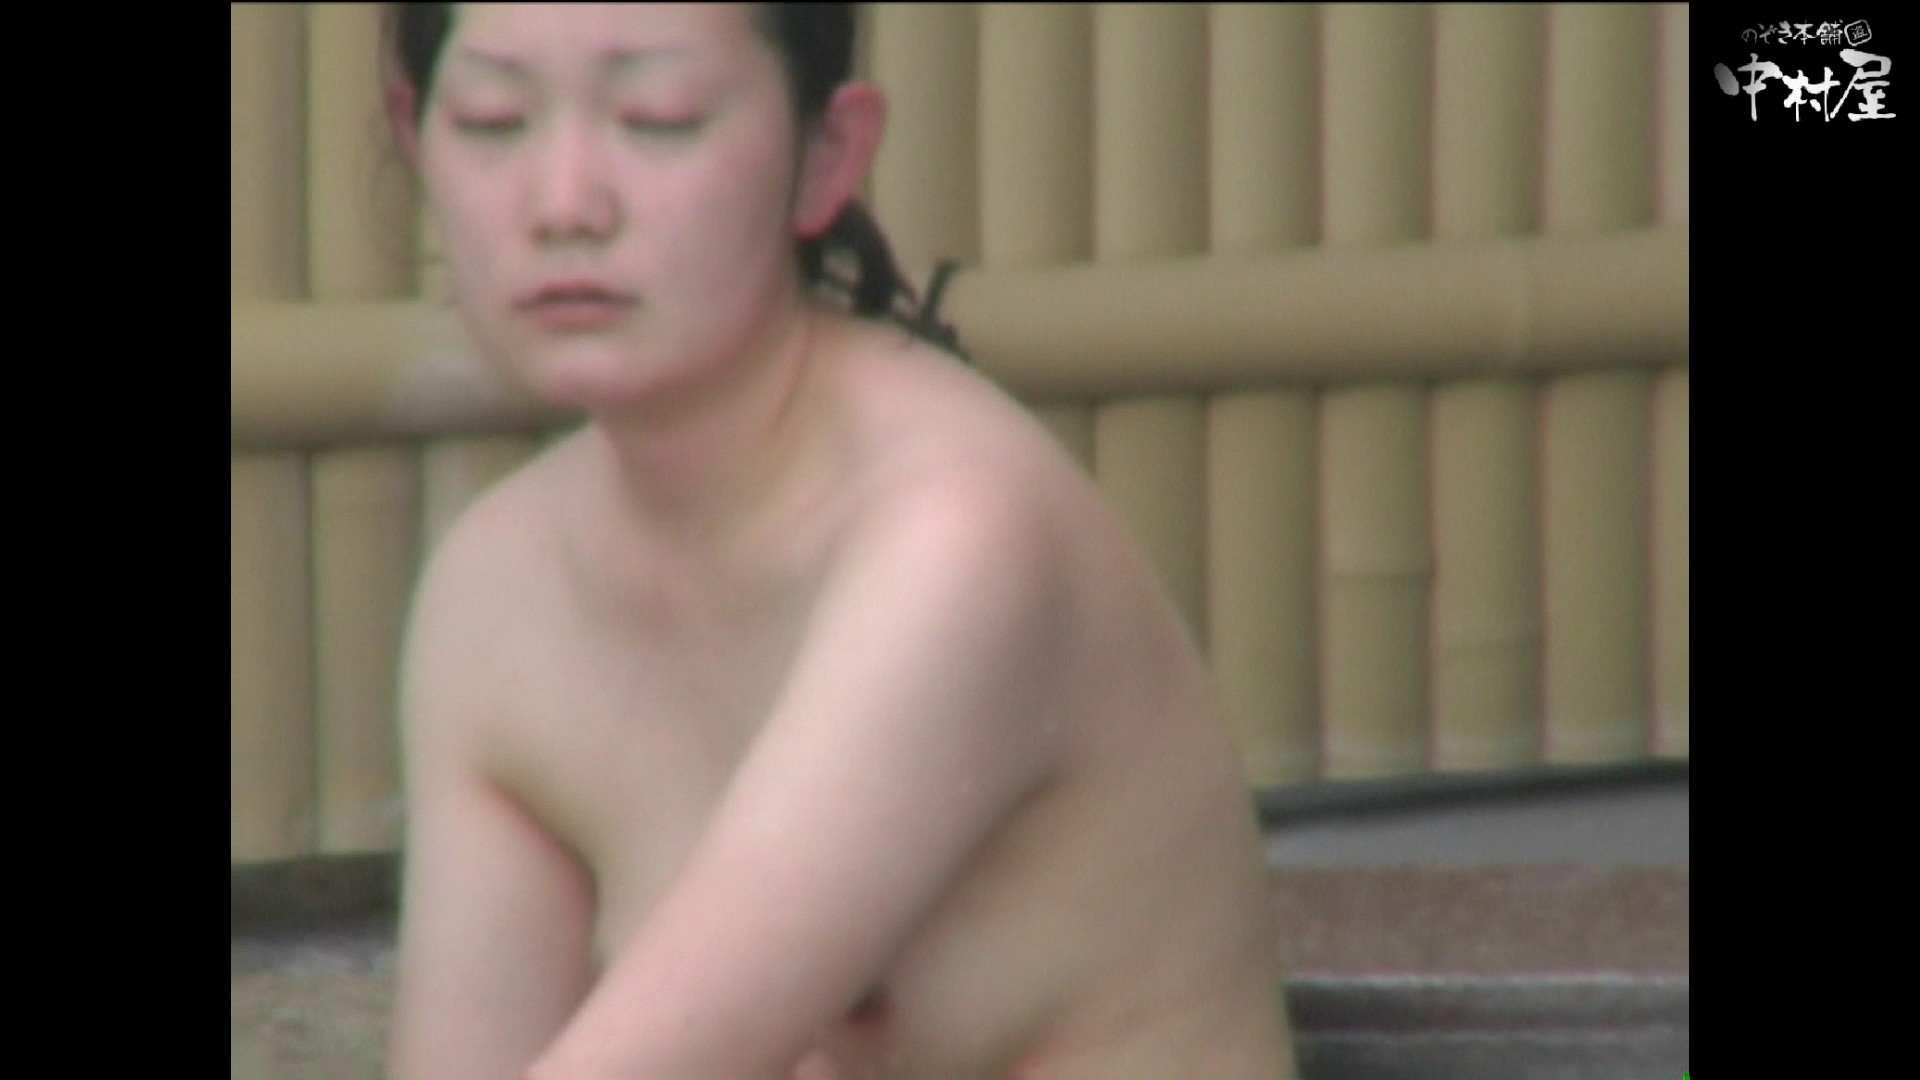 Aquaな露天風呂Vol.892 盗撮師作品  72pic 42